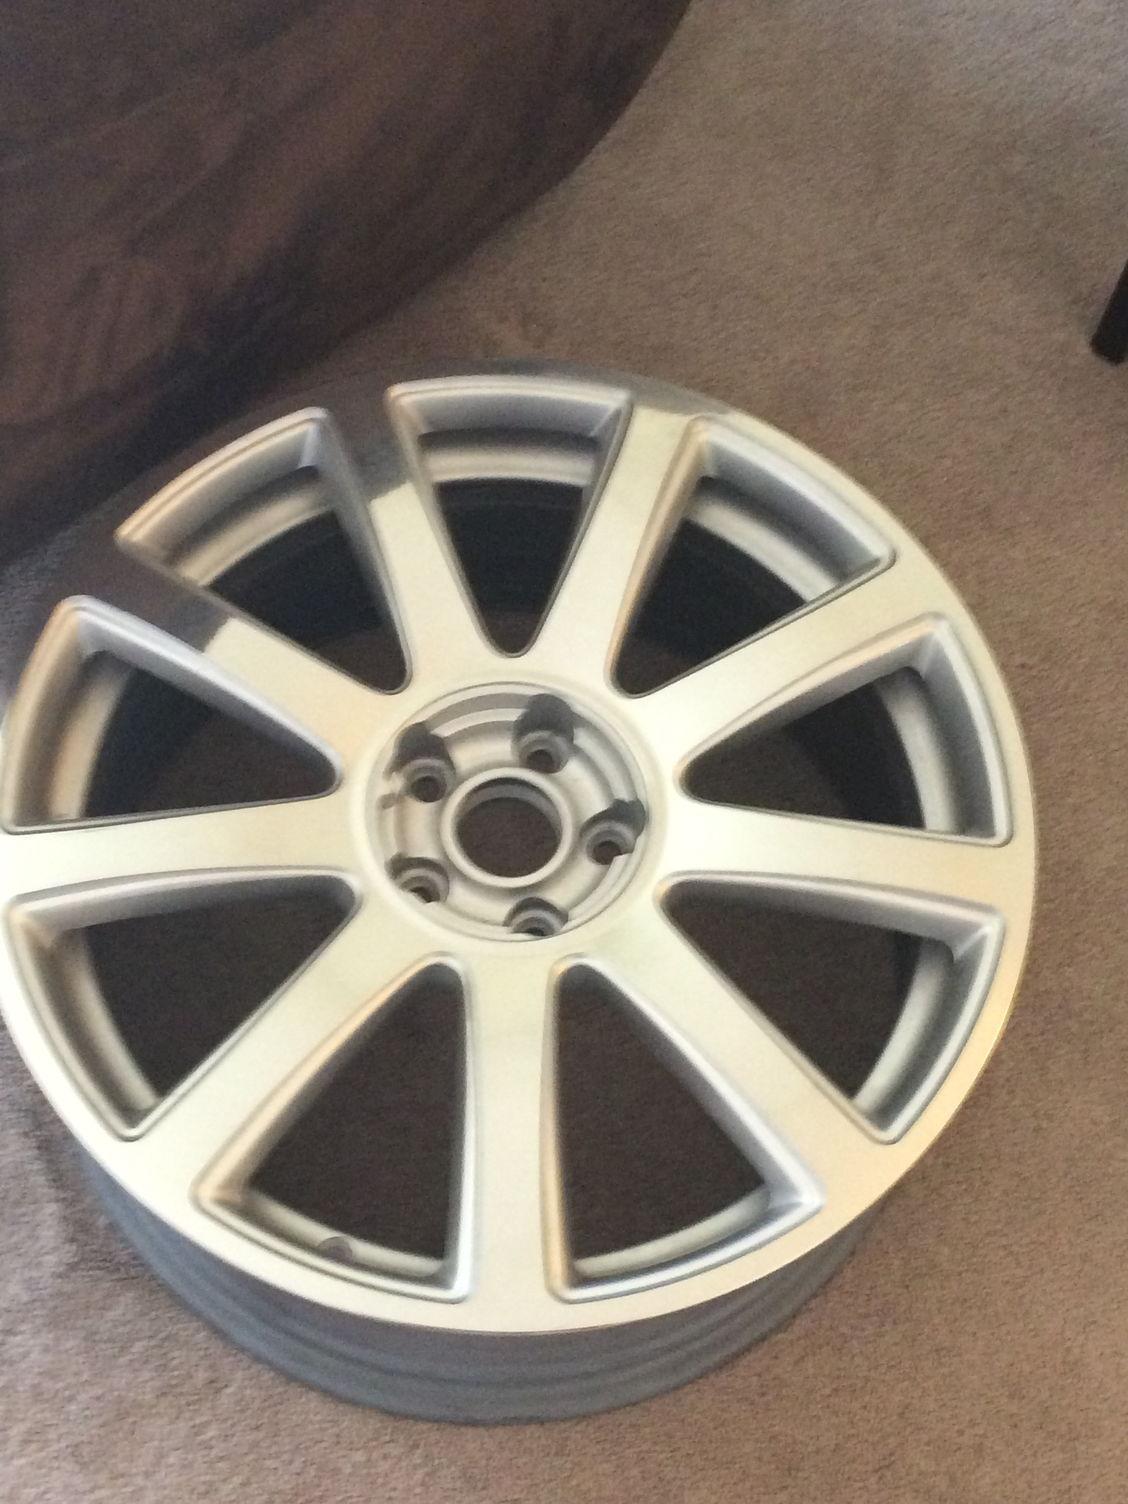 Correct tire setup for W12 20inch wheel? - AudiWorld Forums